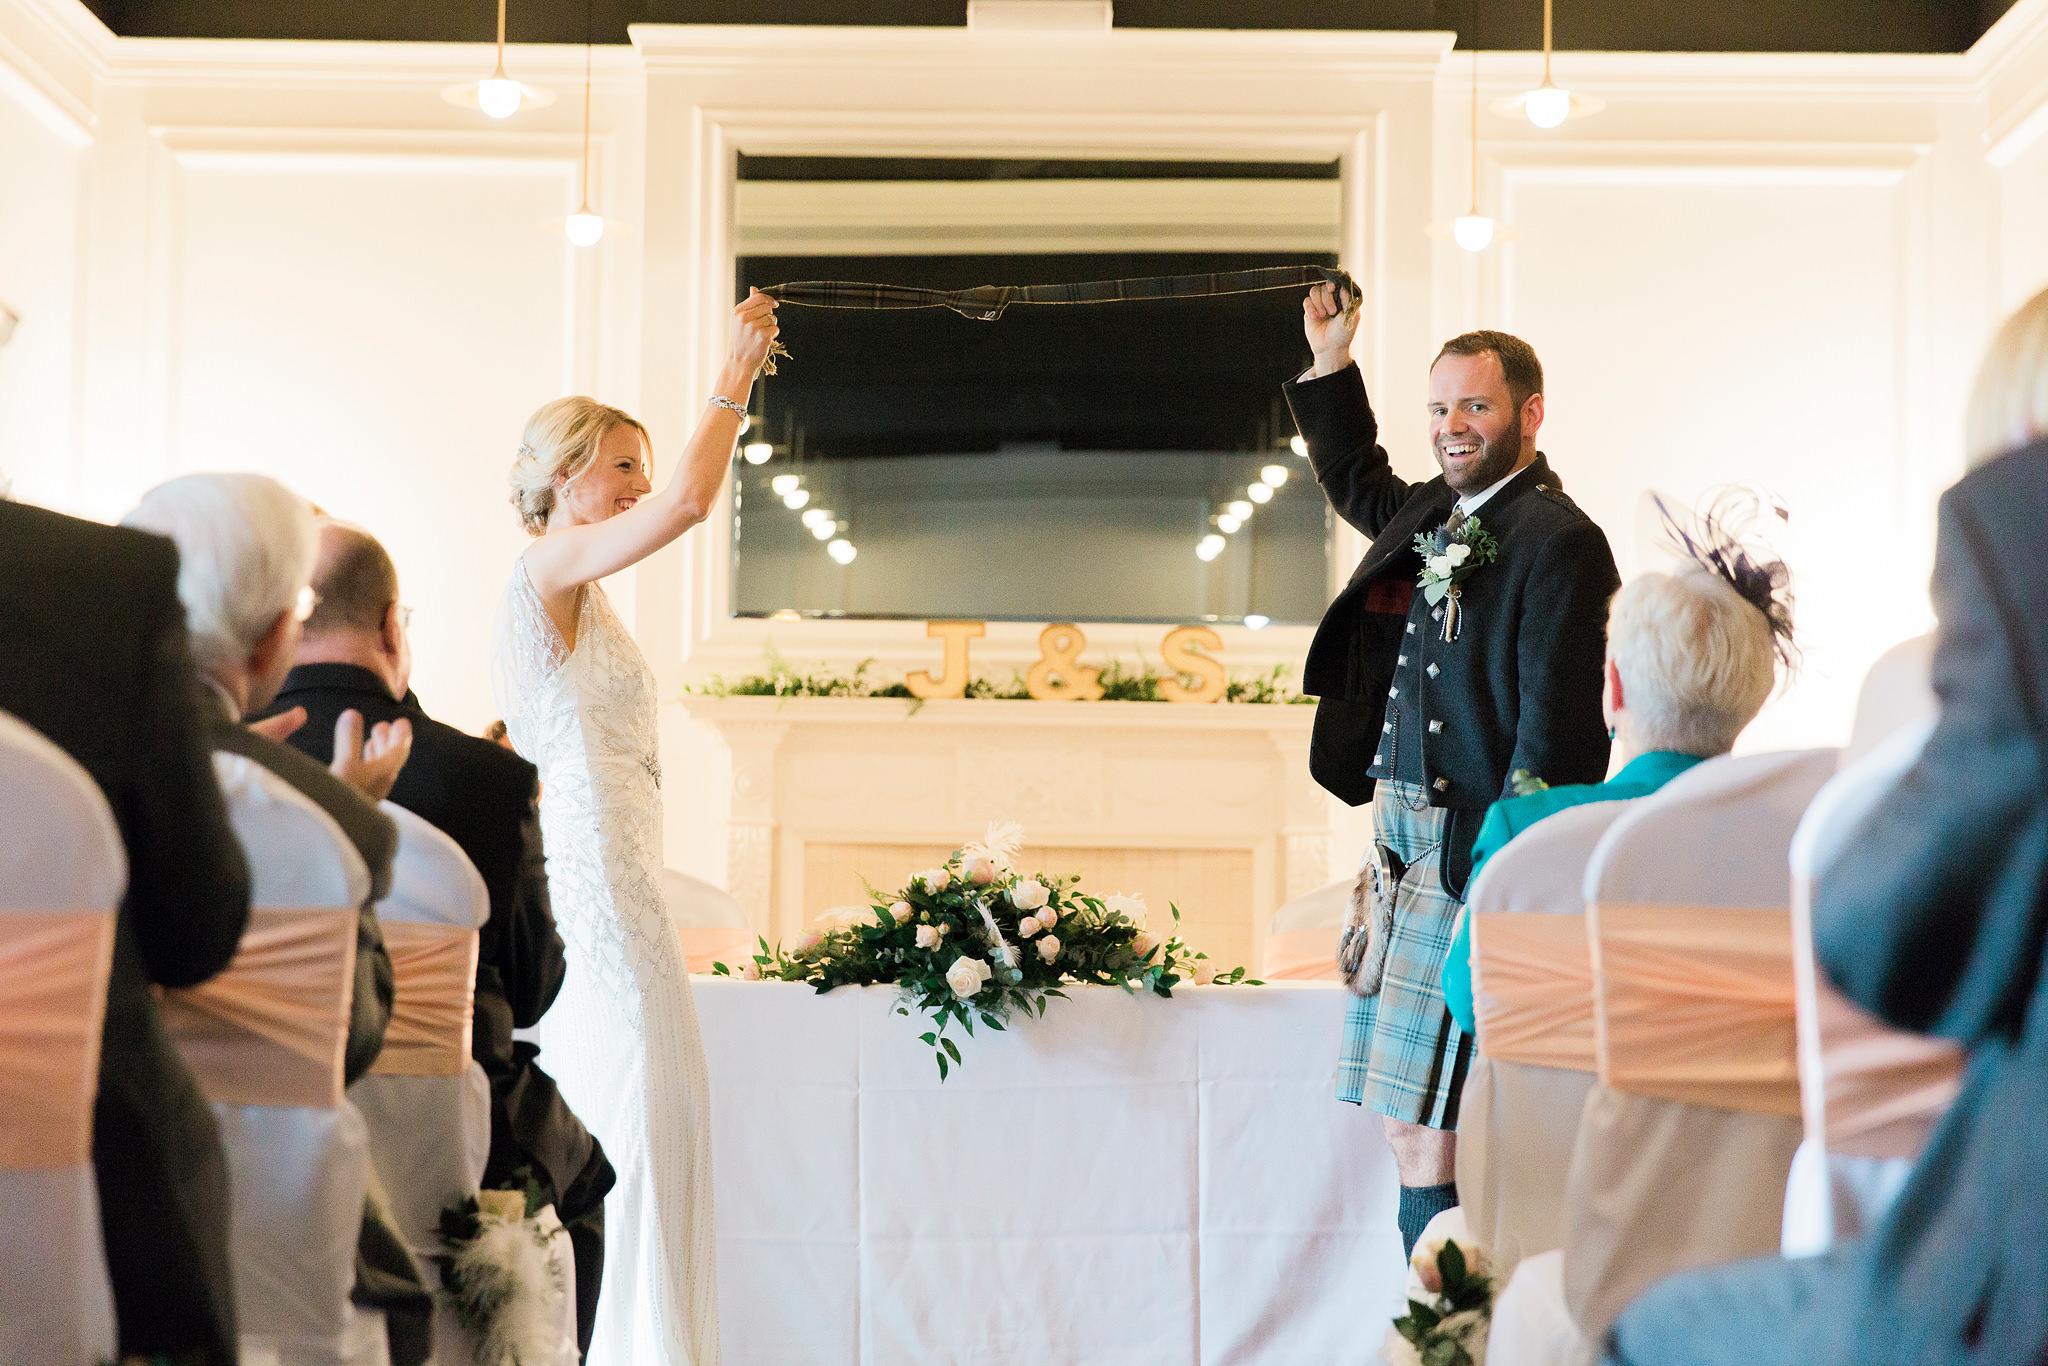 075-wedding-photography-peebles.jpg